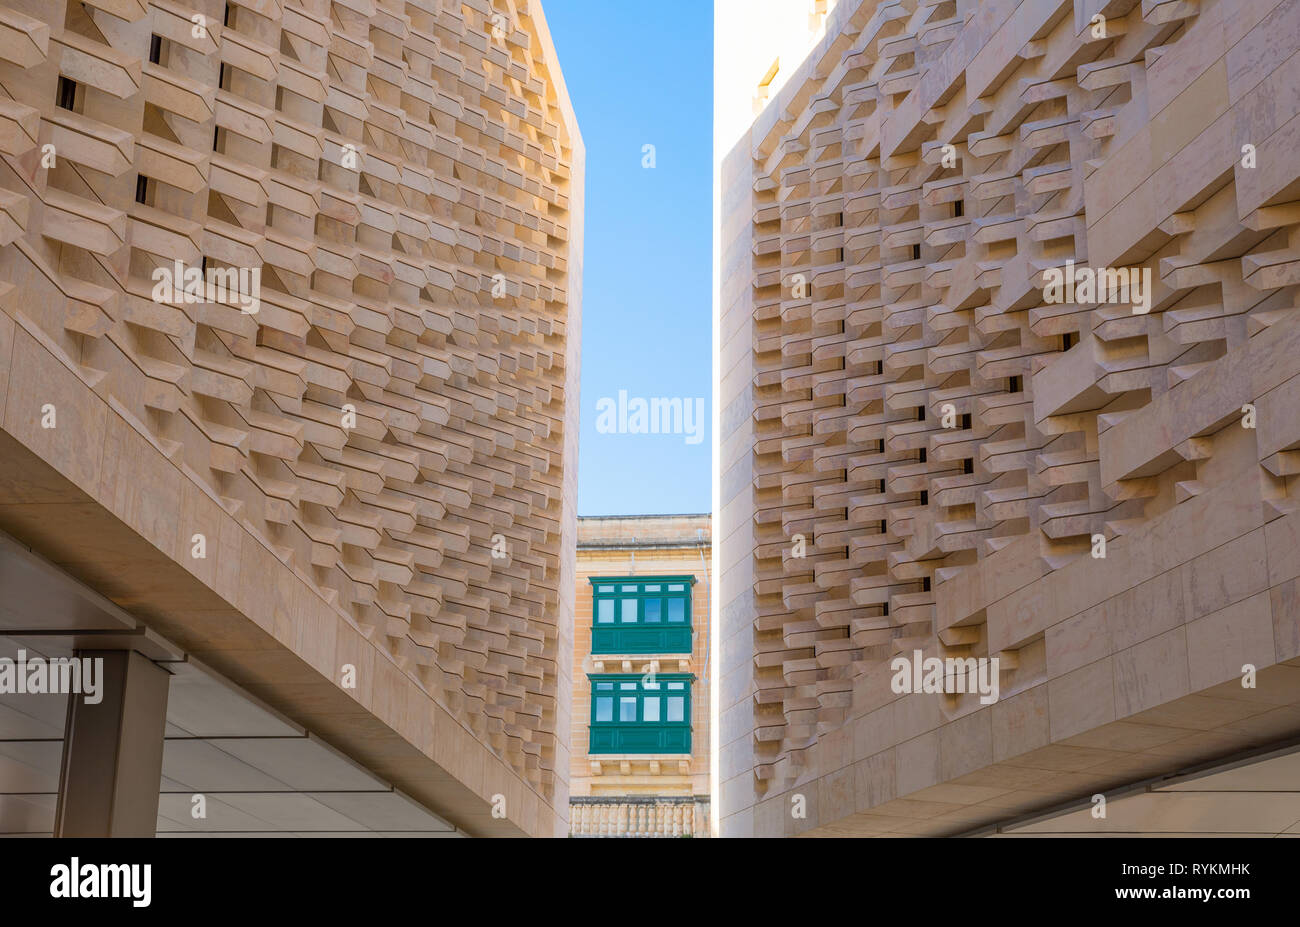 Malta, Valletta, The new Parliament Building, designed by Renzo Piano - Stock Image